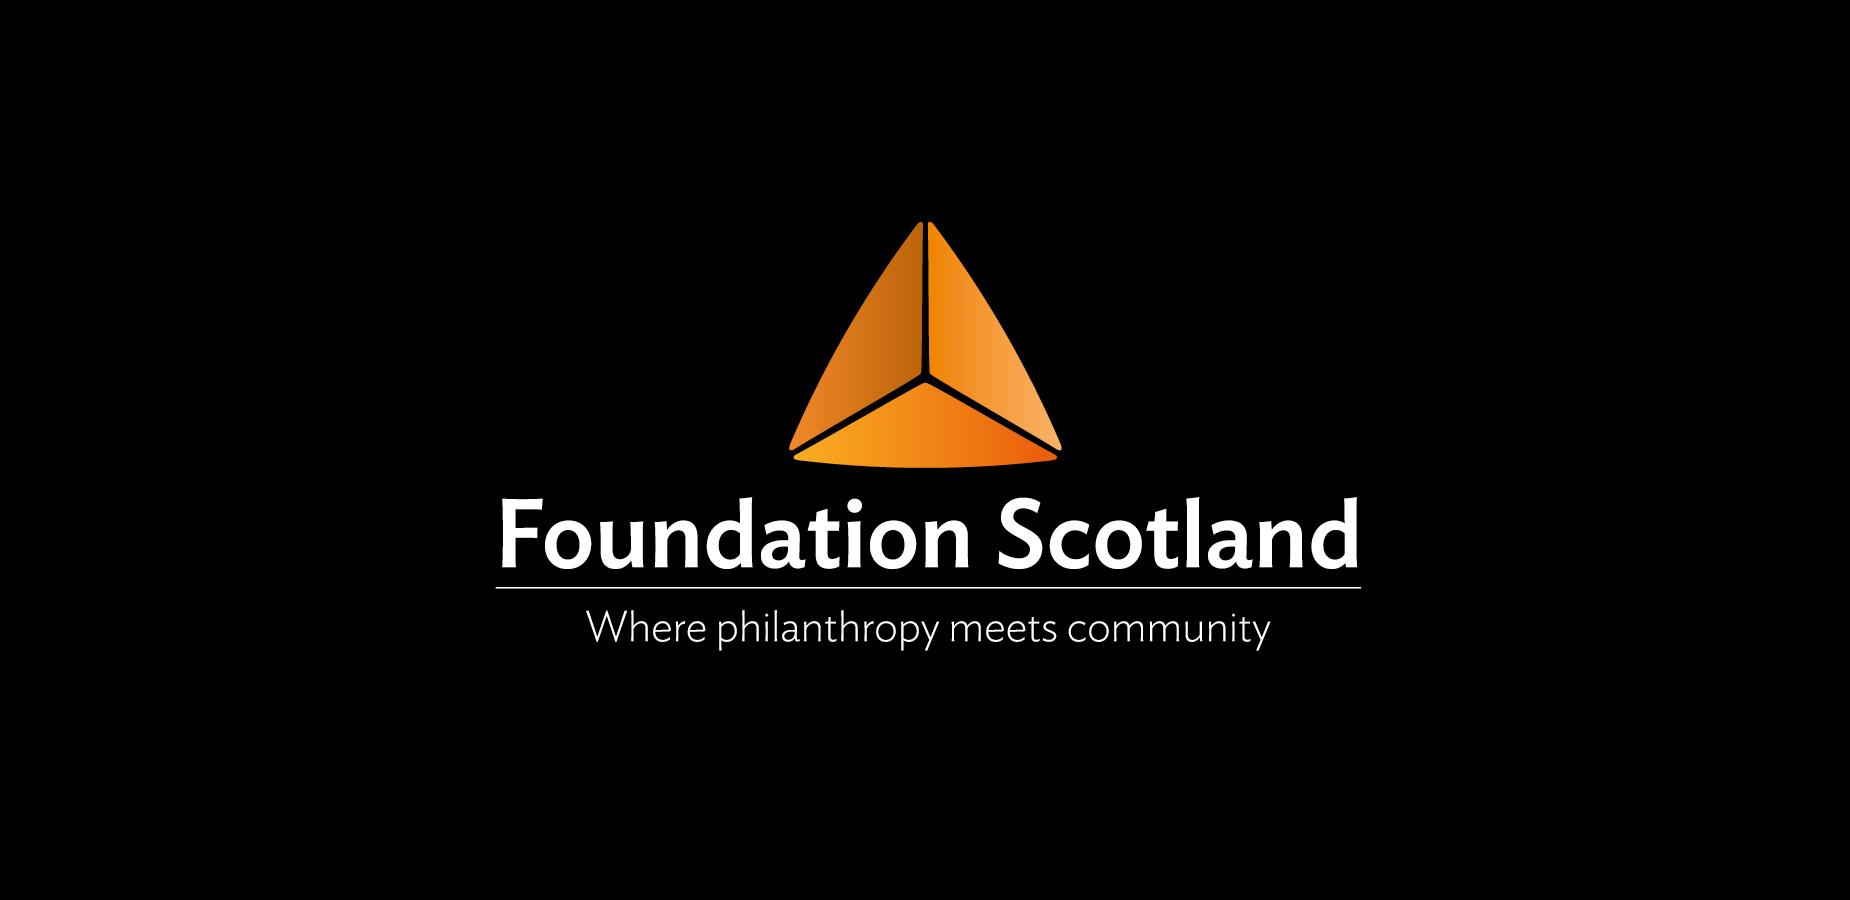 foundation scotland logo 1800x750